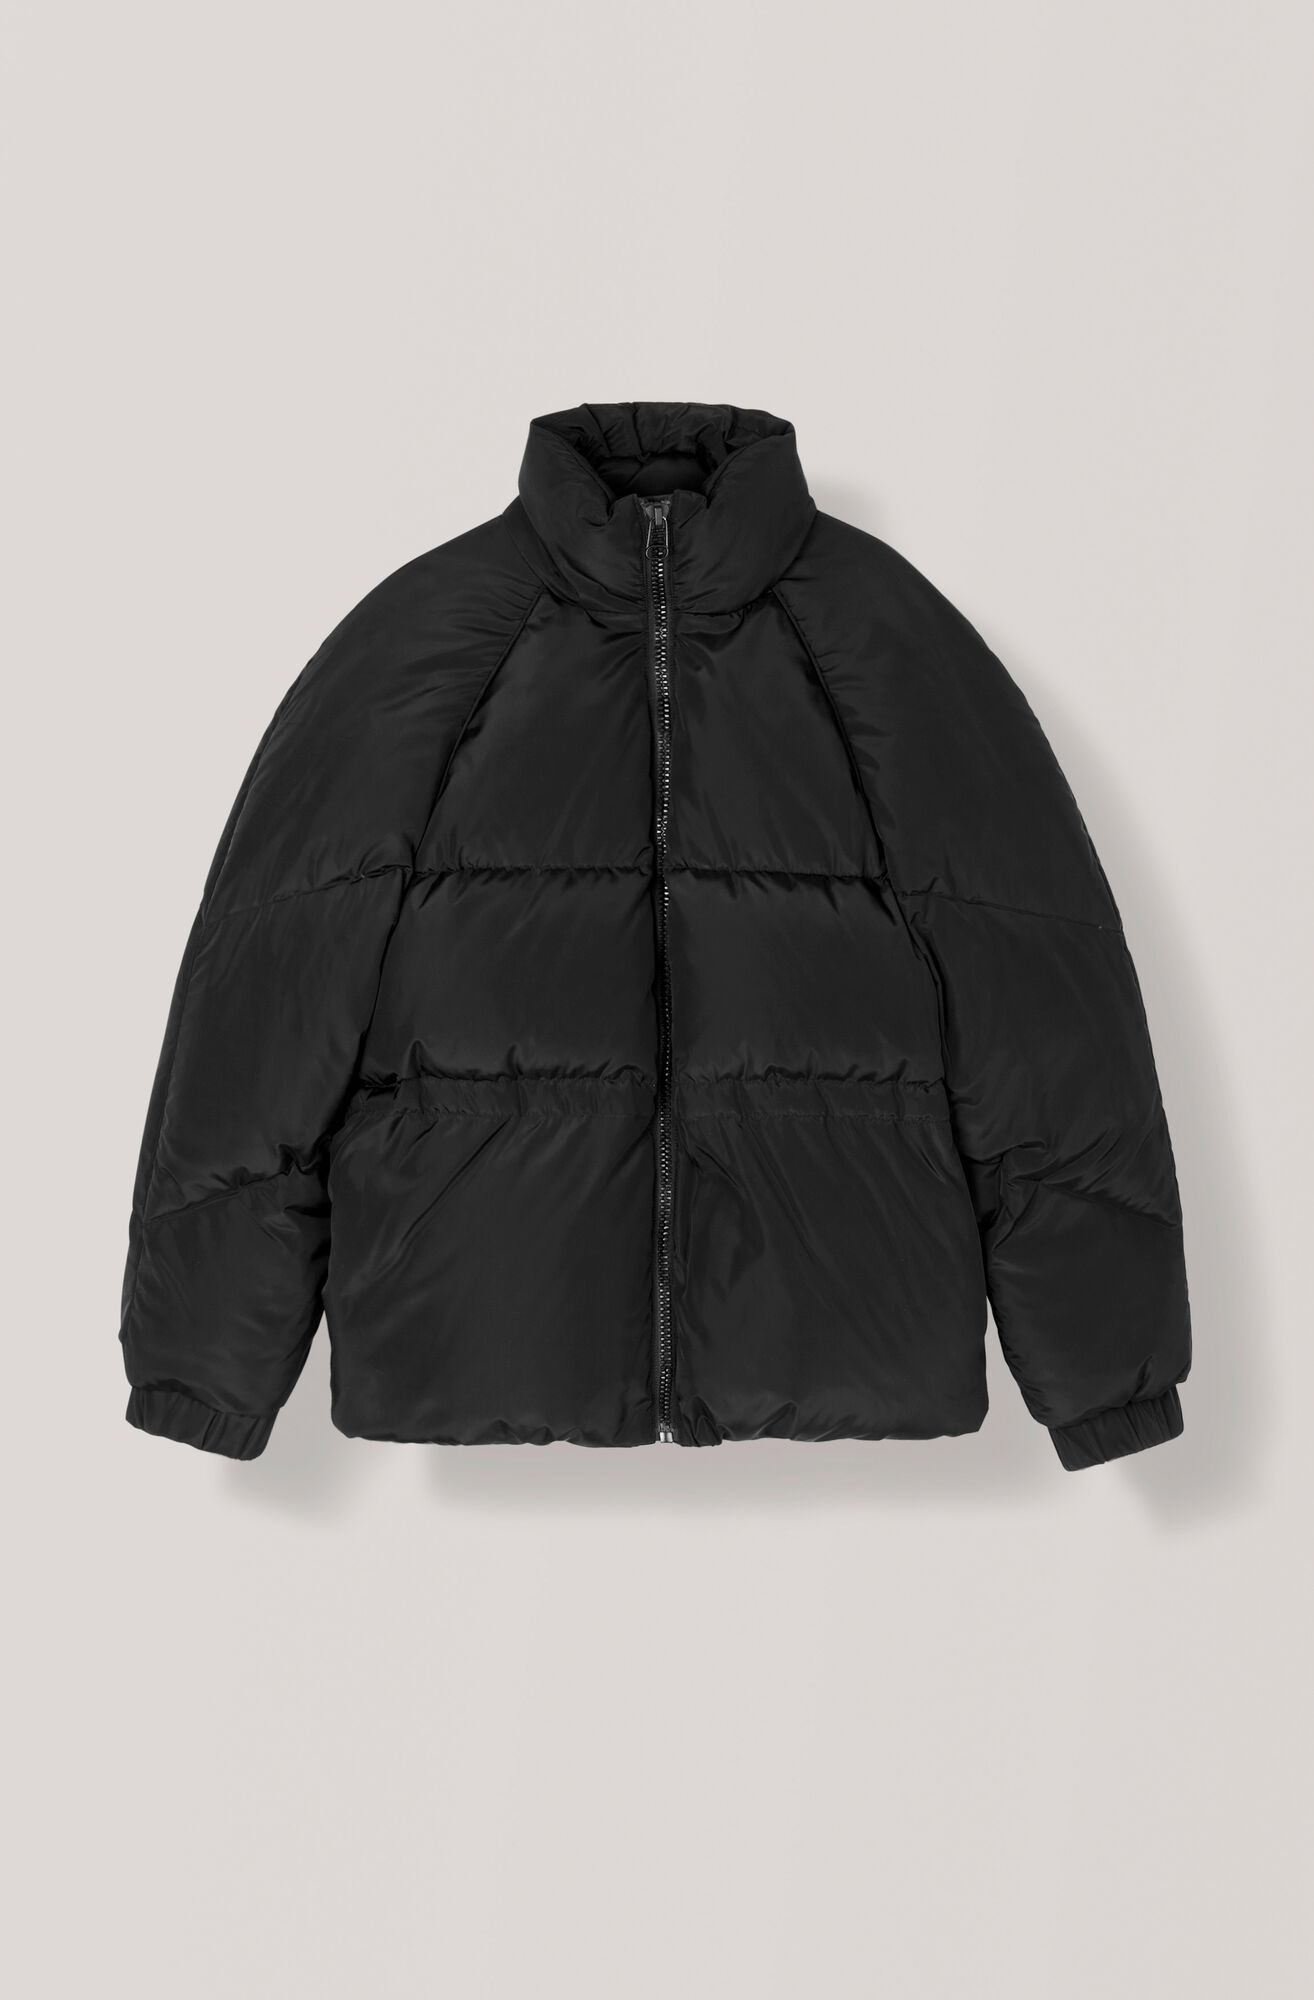 681385ec862da GANNI Tech Down Jacket ( 349.00 EUR ) | Shop your new Tech Down ...